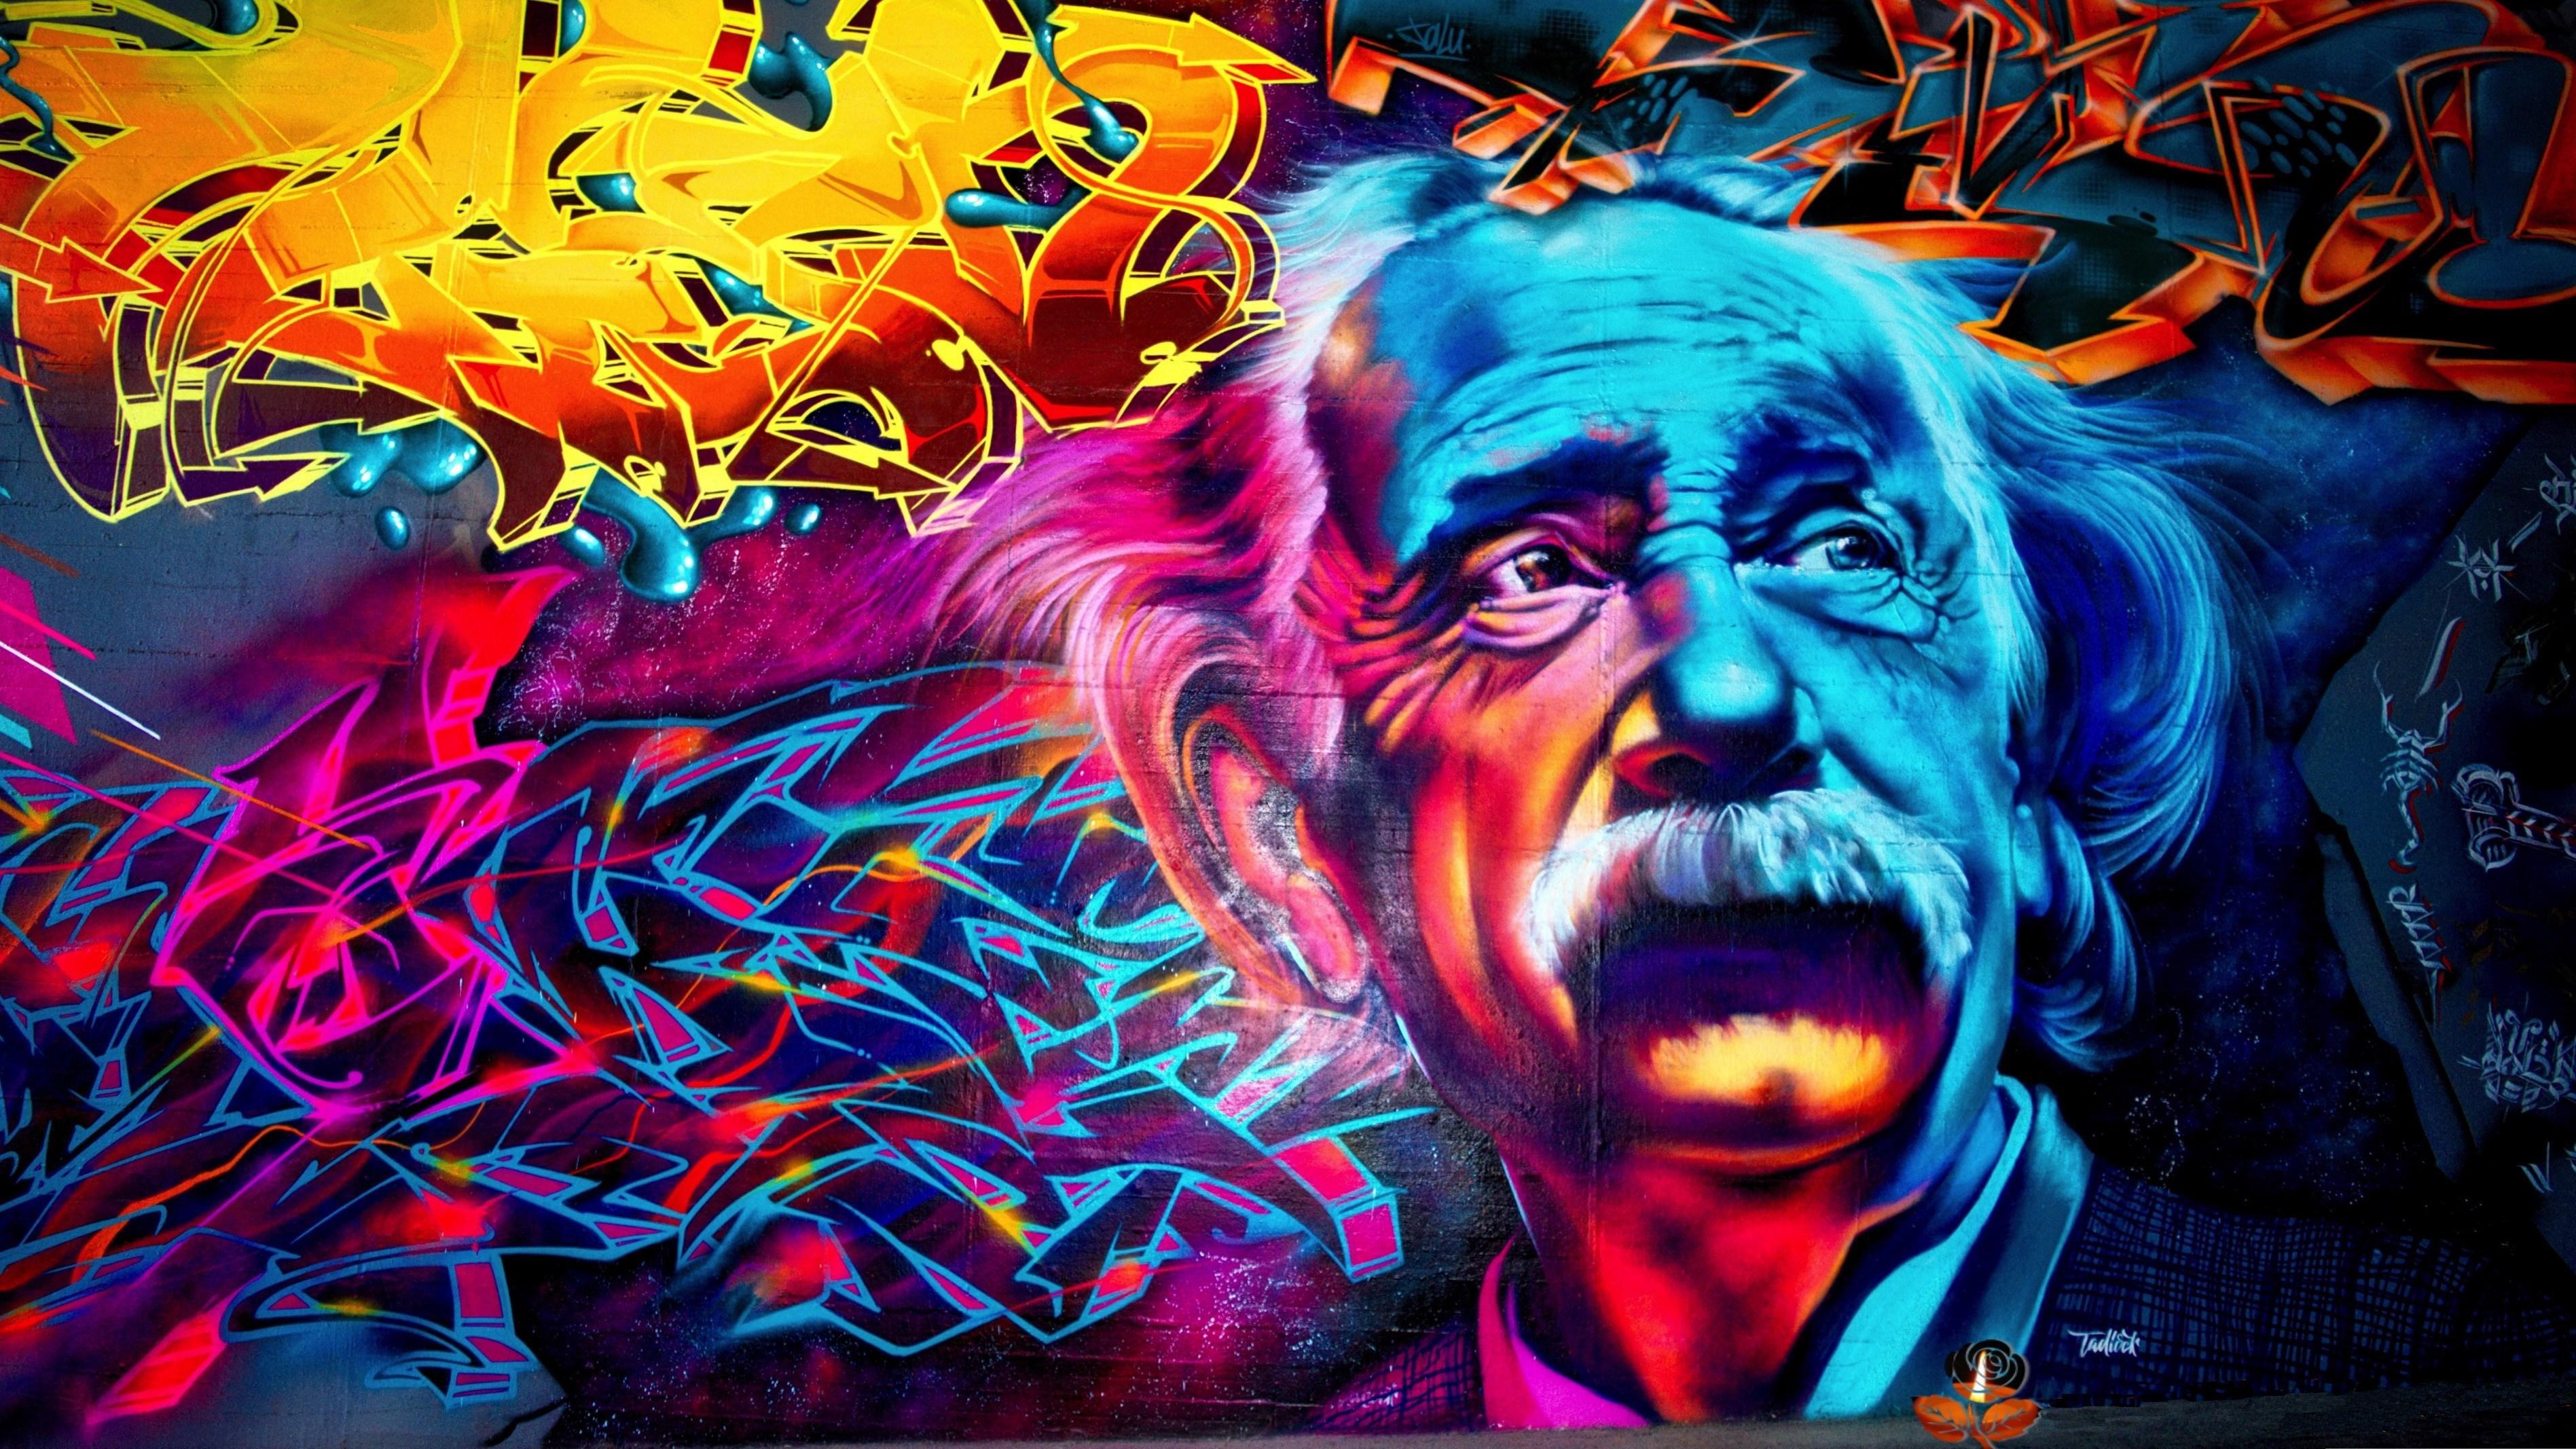 Einstein Graffiti Street Art HD wallpaper 3793x2134